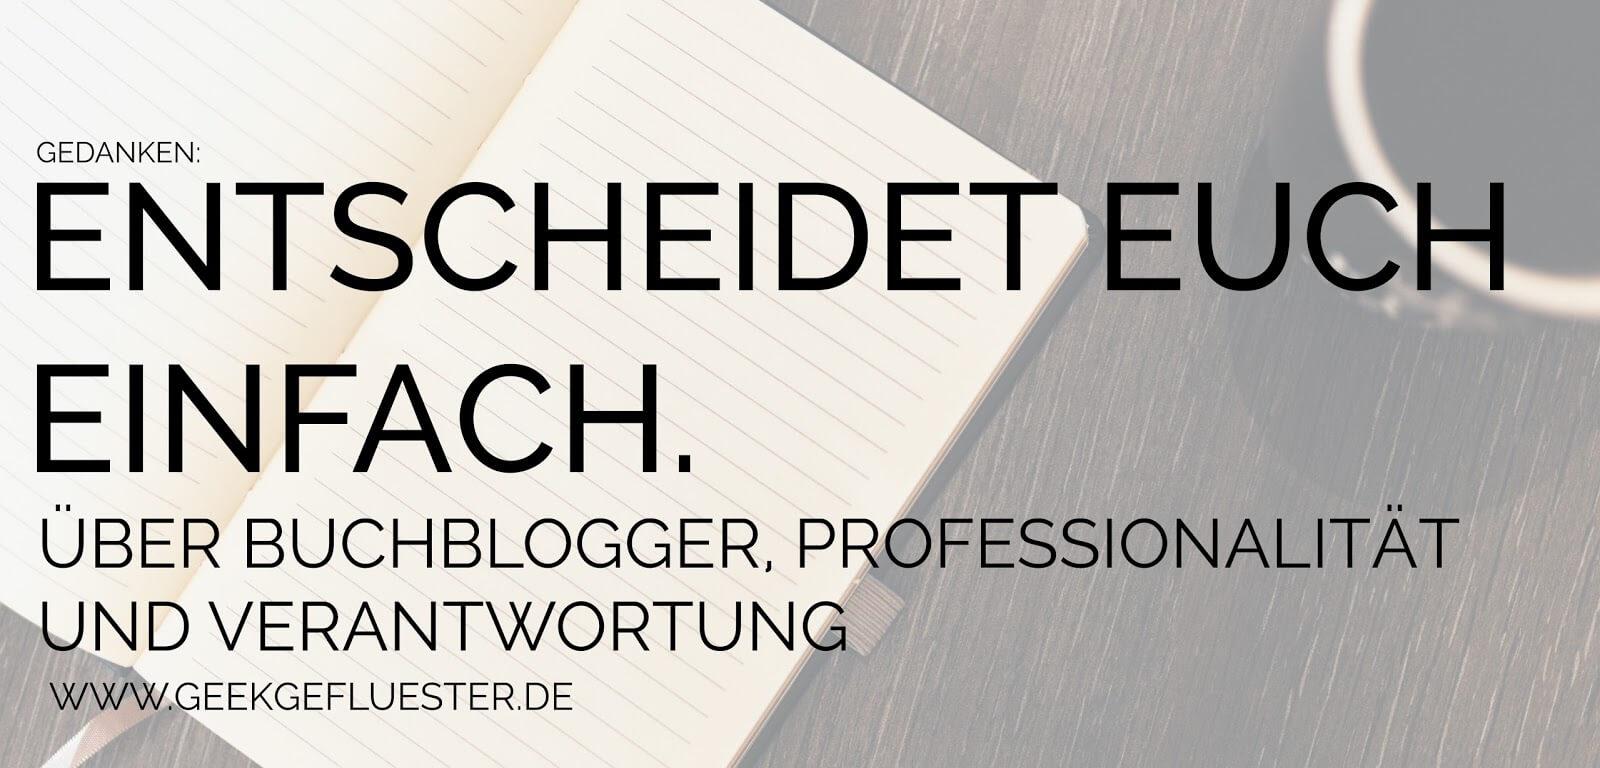 Buchblogger Professionalität